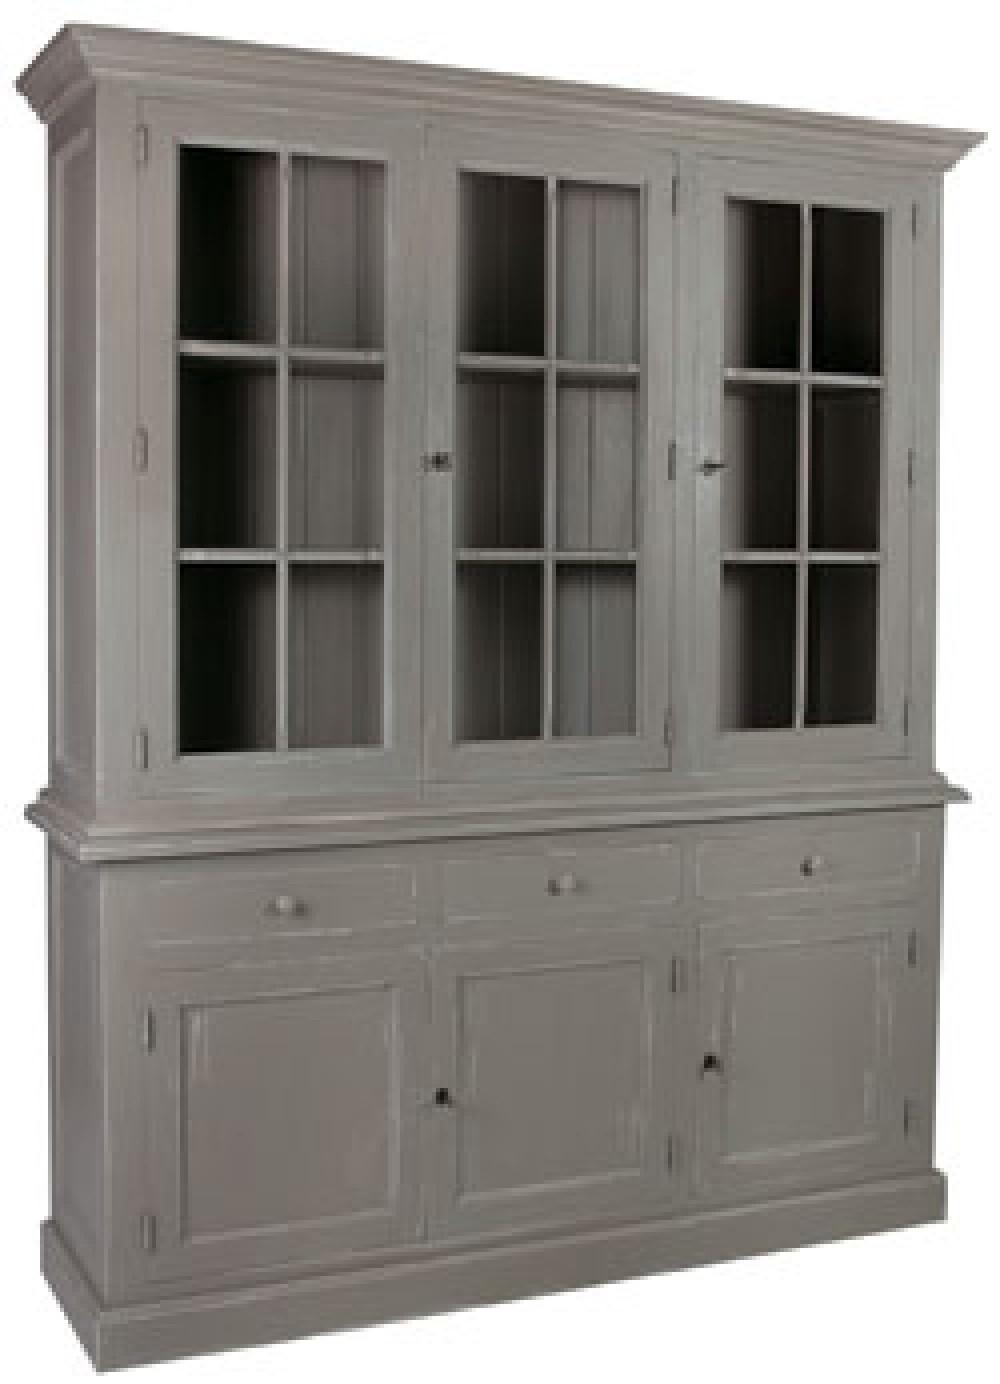 vitrine grau geschirrschrank grau massivholz k chenschrank grau landhaus breite 185 cm. Black Bedroom Furniture Sets. Home Design Ideas